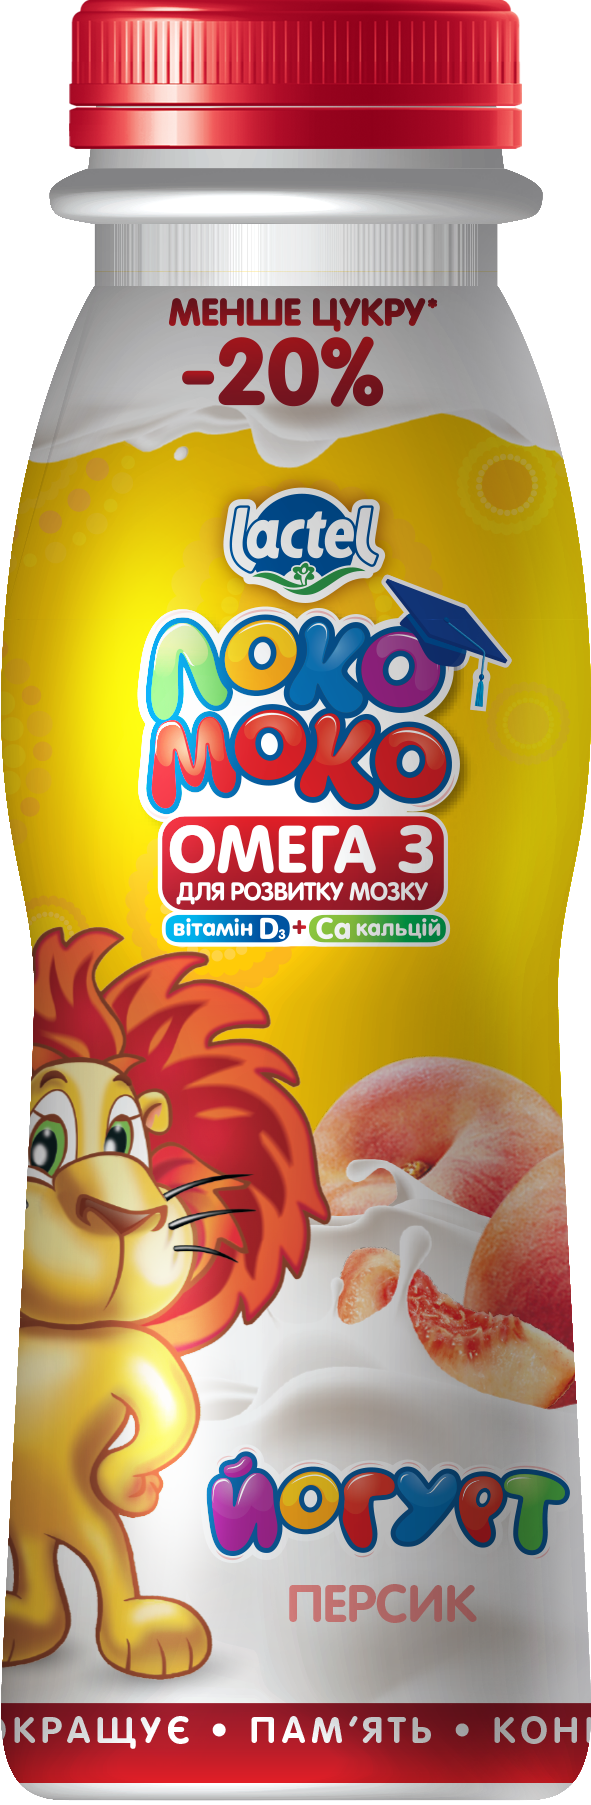 Drinkable yoghurt 1,5% Peach, with Calcium, Omega3 and Vitamin D3 Loko Moko (bottle 0,185 kg)